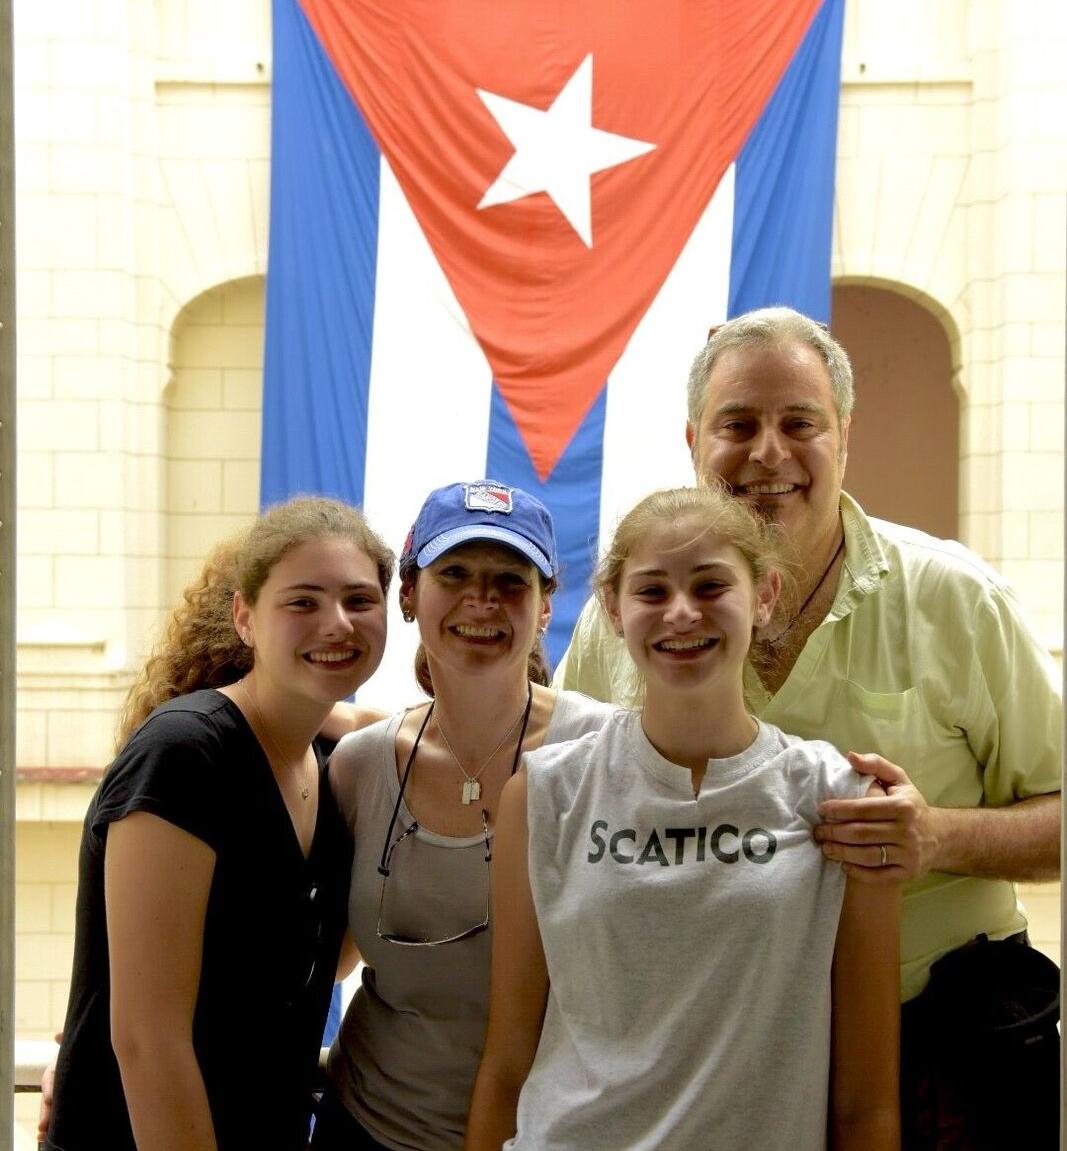 Scatico shirt in Havana!